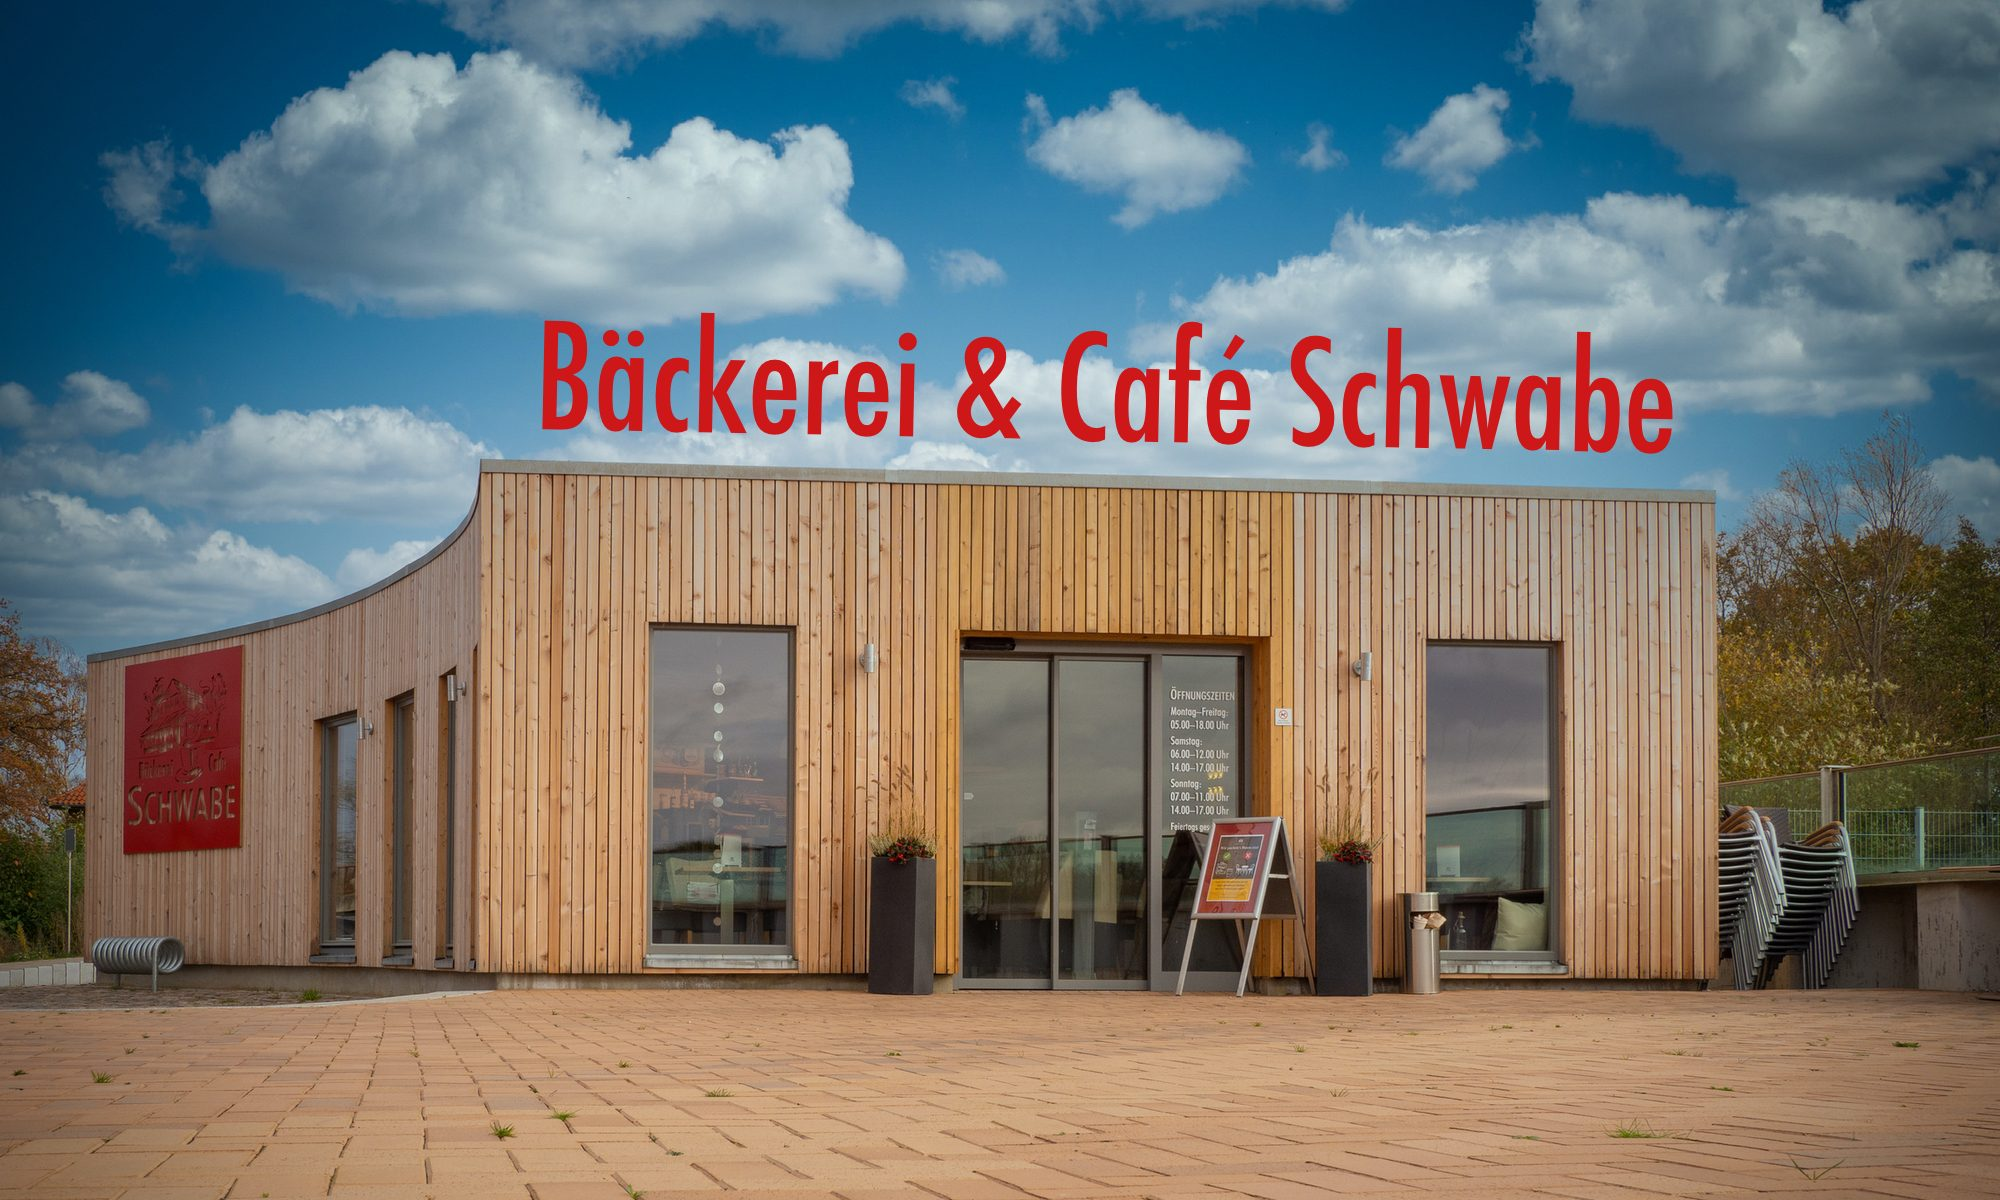 Bäckerei & Cafe Schwabe